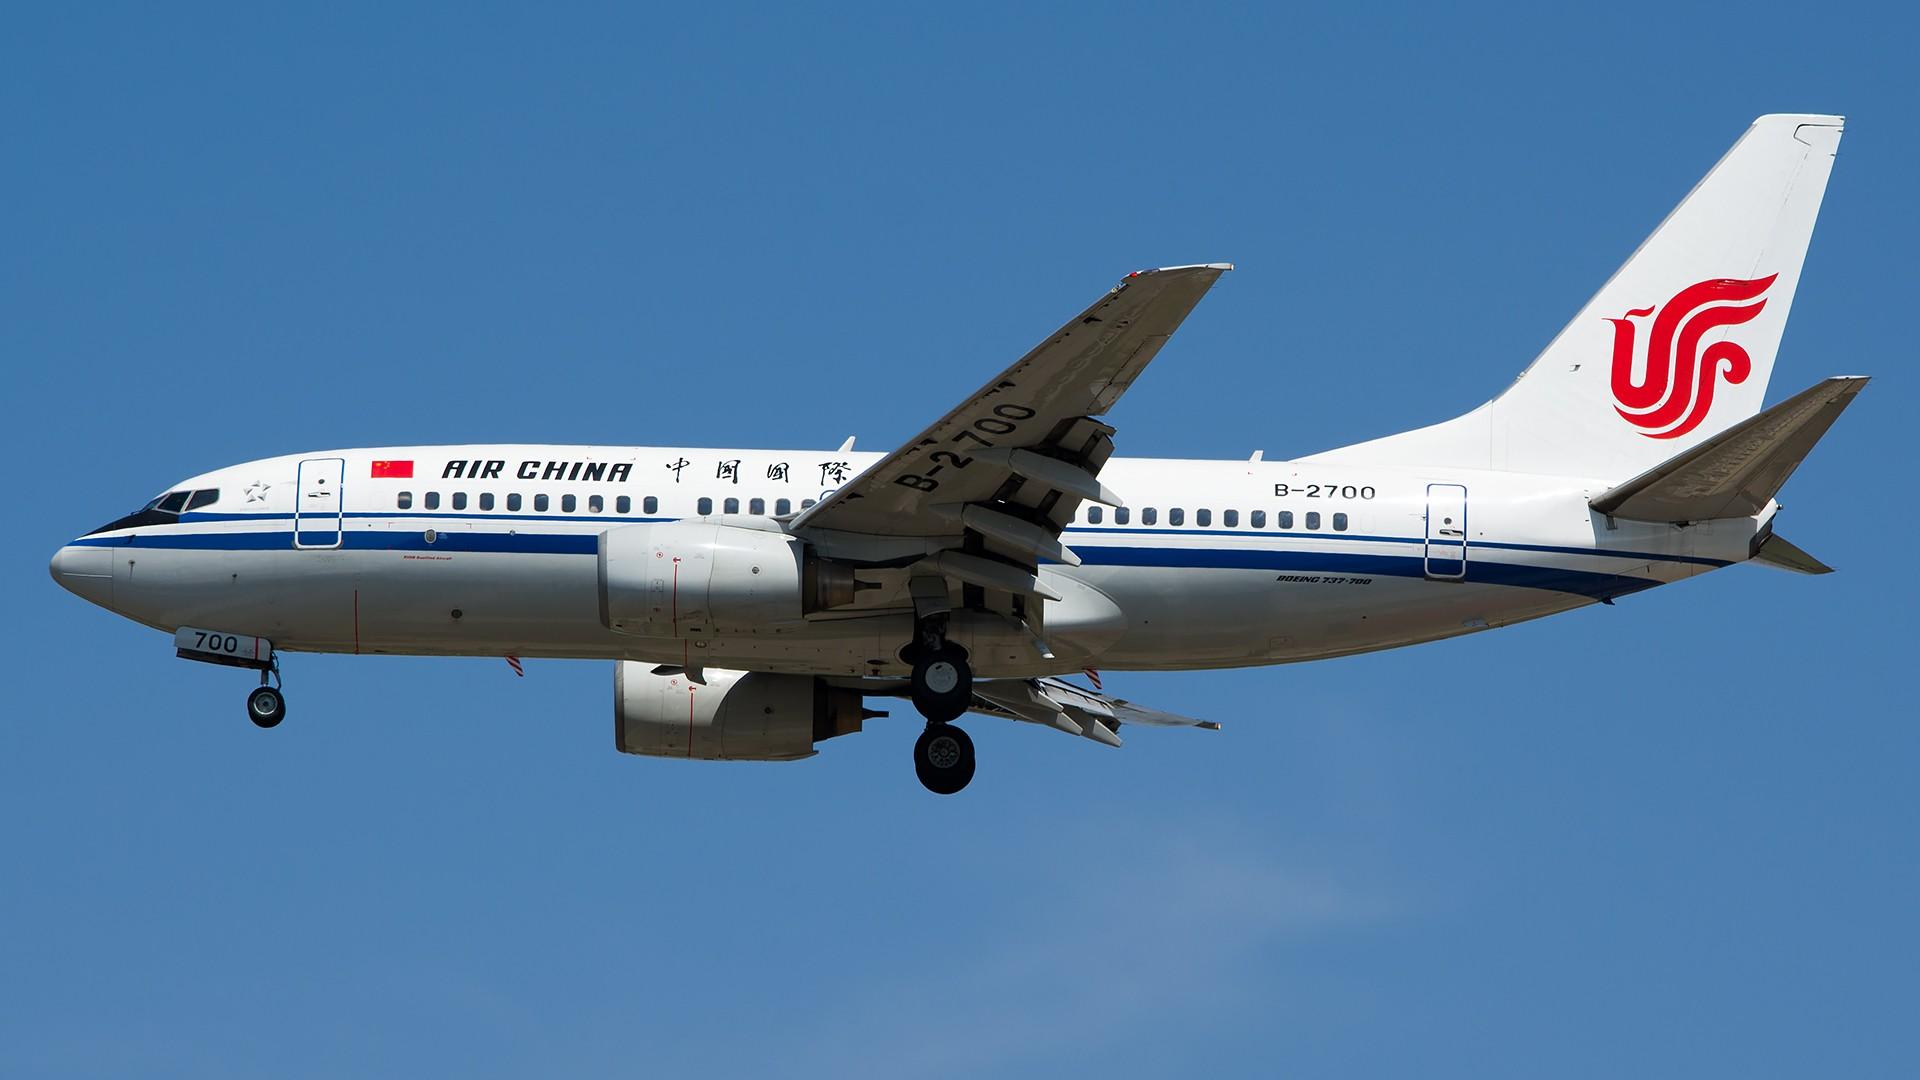 Re:[原创]高空低涡最后一天的PEK杂图【2015-6-14】 BOEING 737-700 B-2700 中国北京首都国际机场